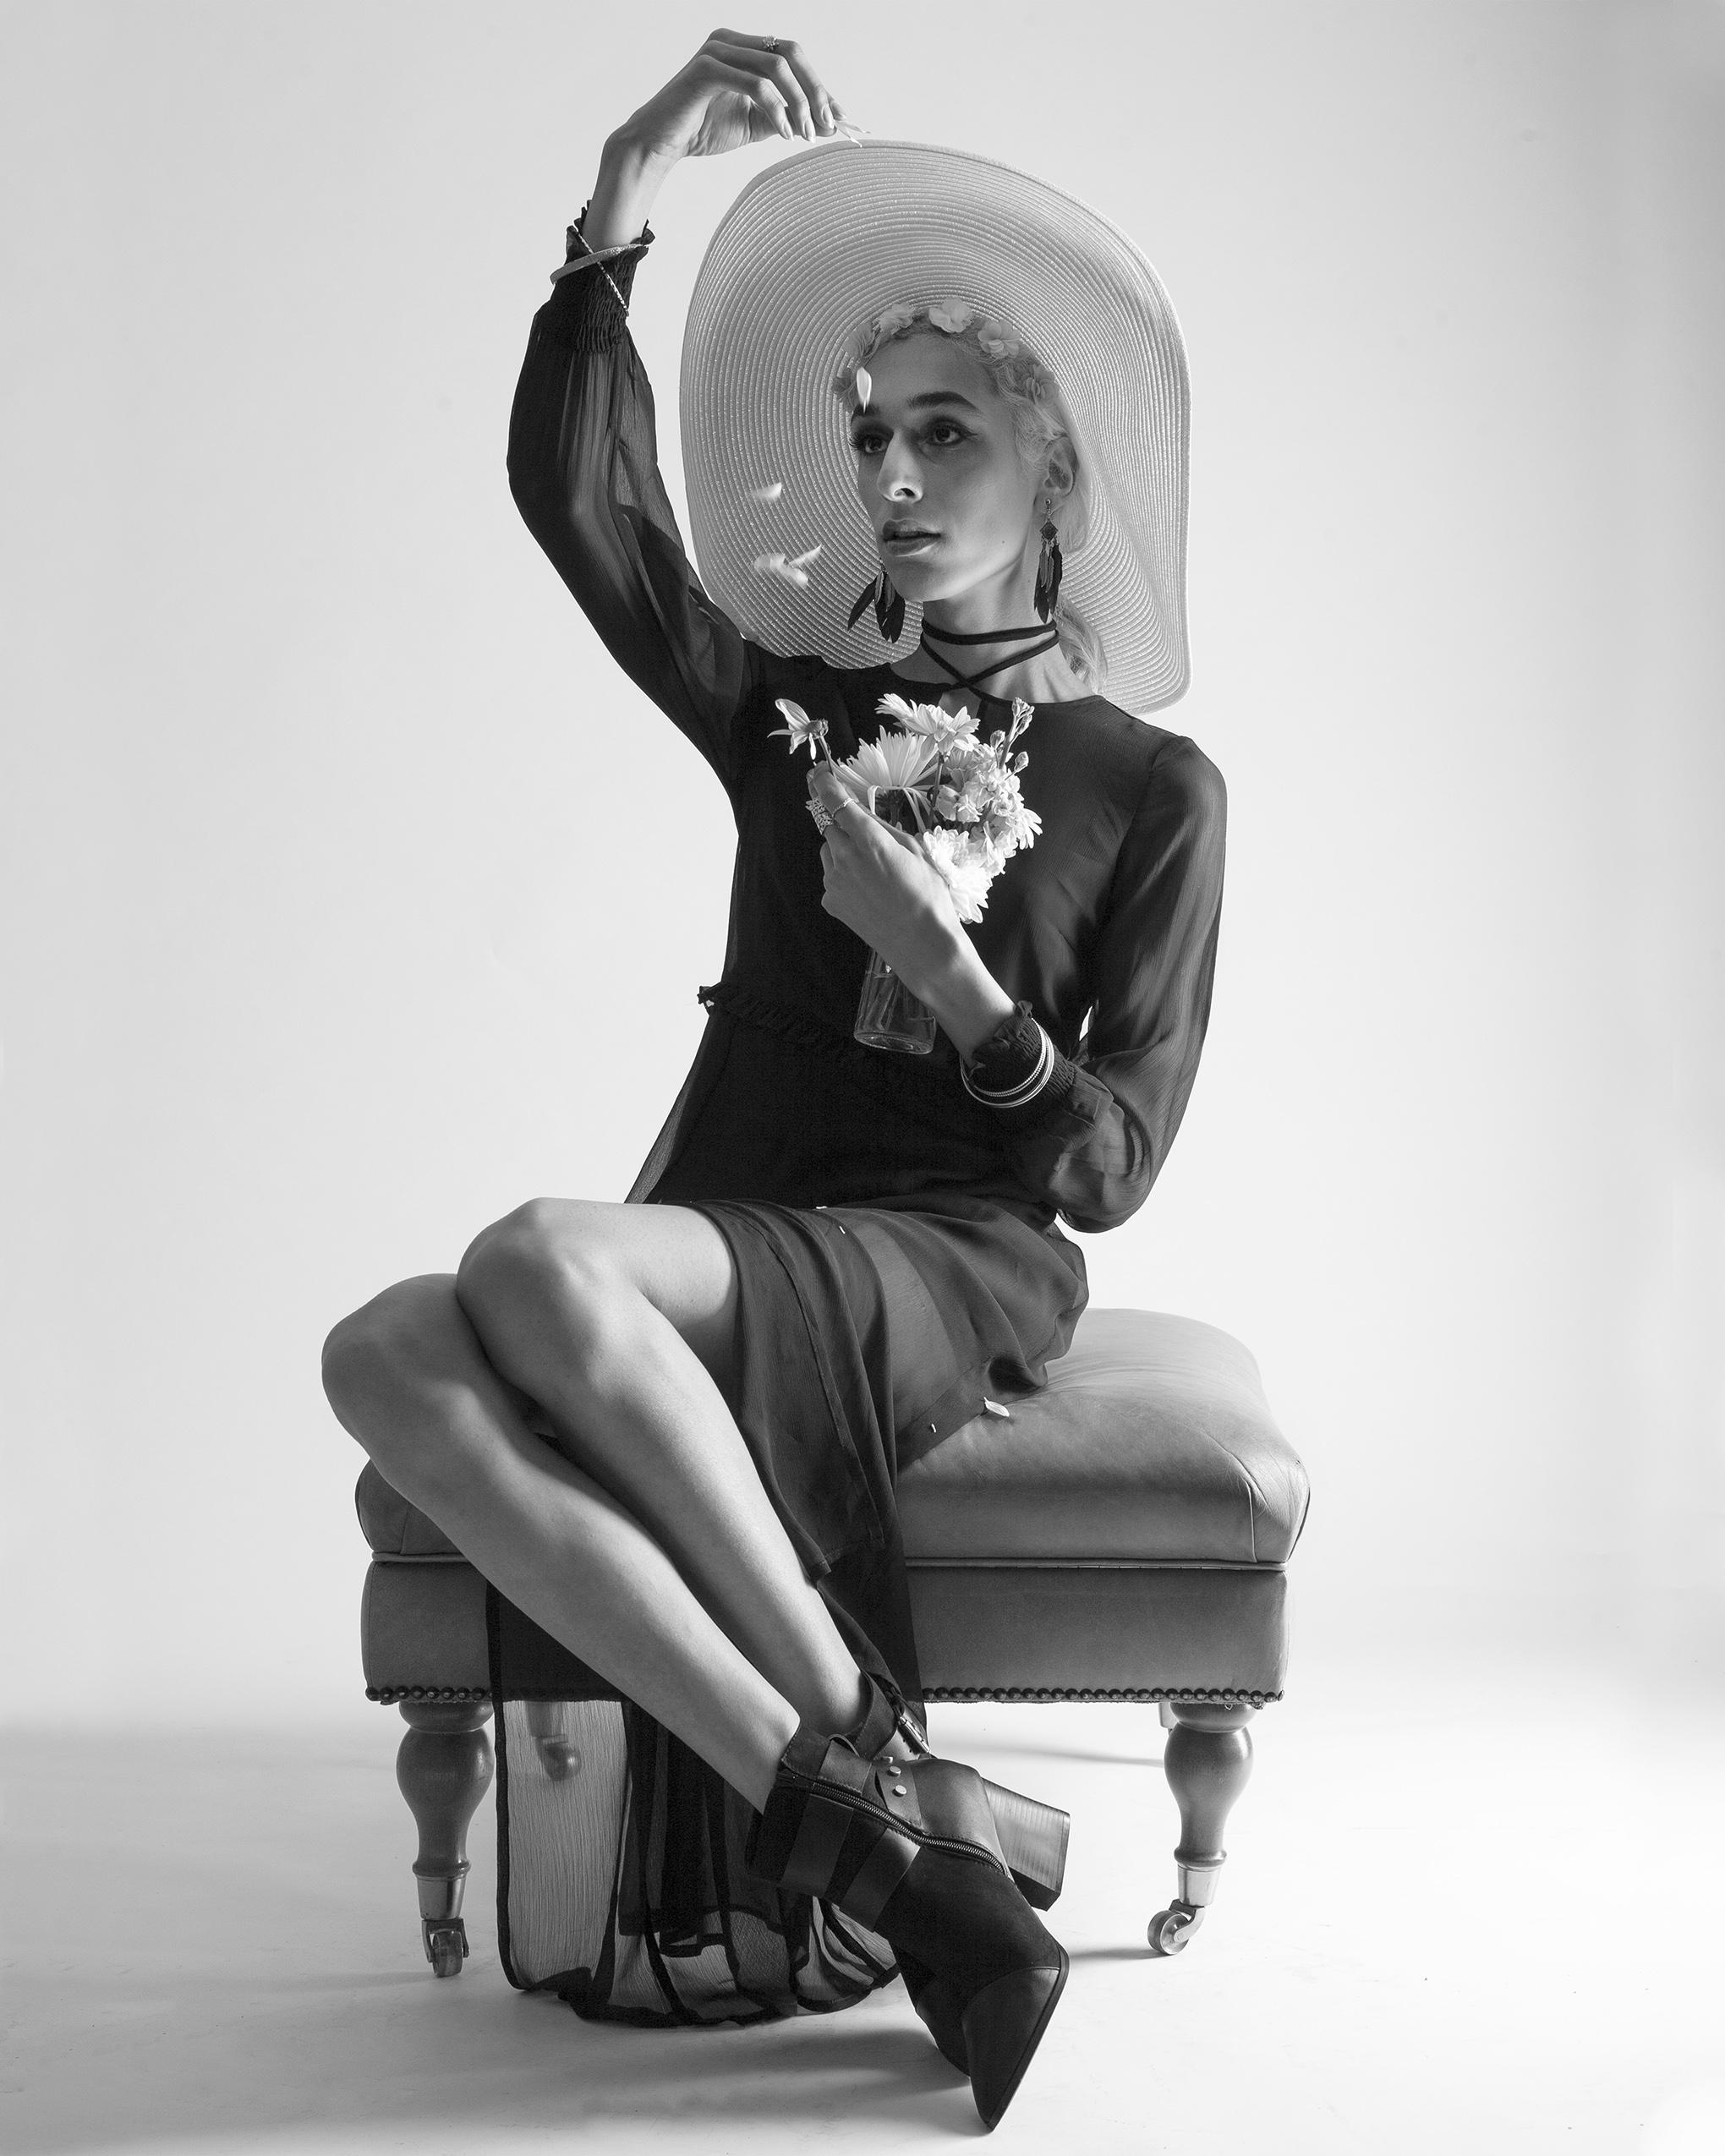 Hat: LAWLIET Dress: VERO MODA chiffon sheer maxi dress Shoes: MODEL'S OWN